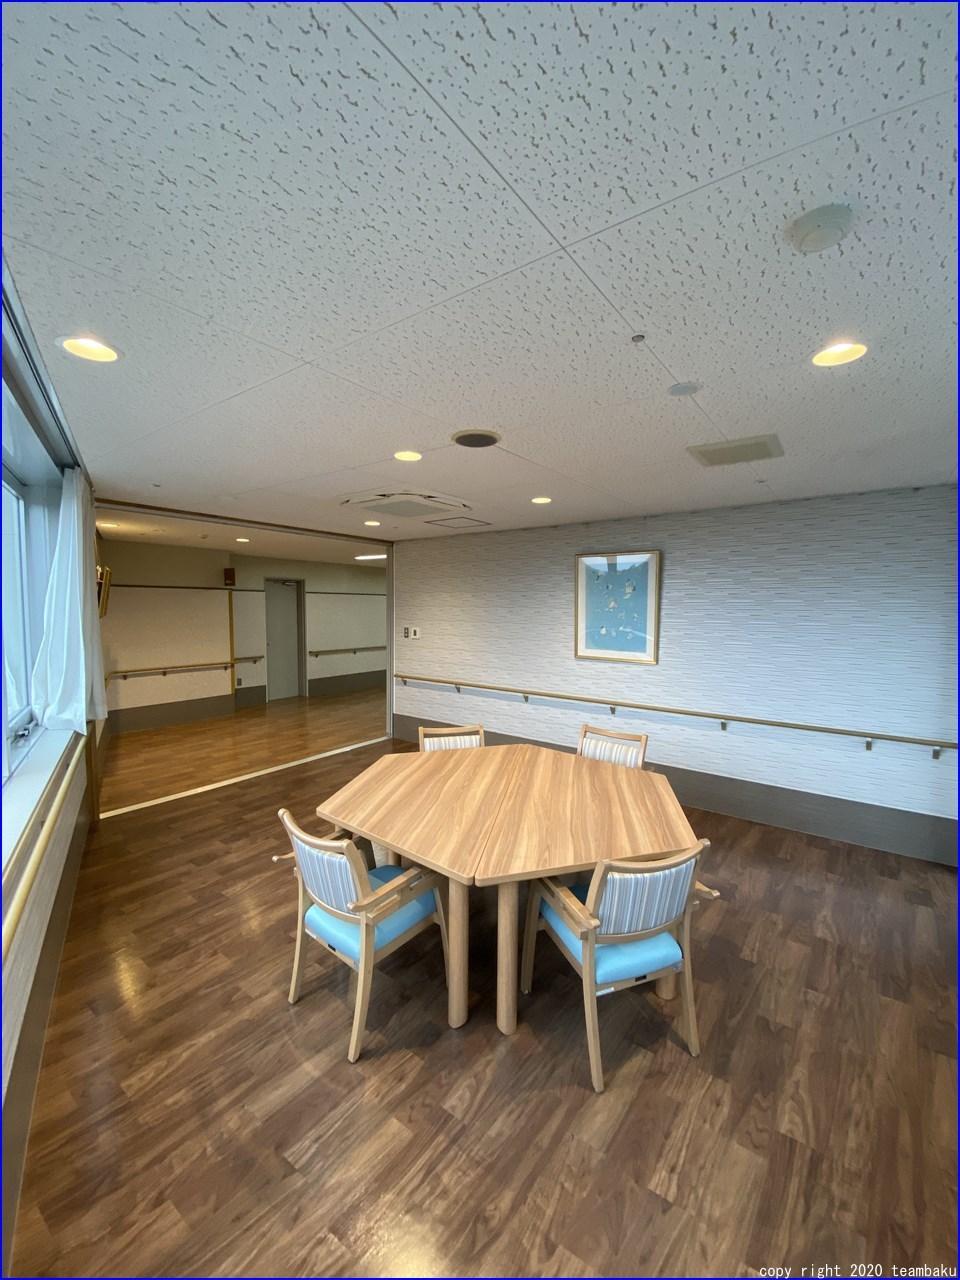 N病院グループ N病院東館 介護医療院 転換改修工事 4_c0376508_10424630.jpg